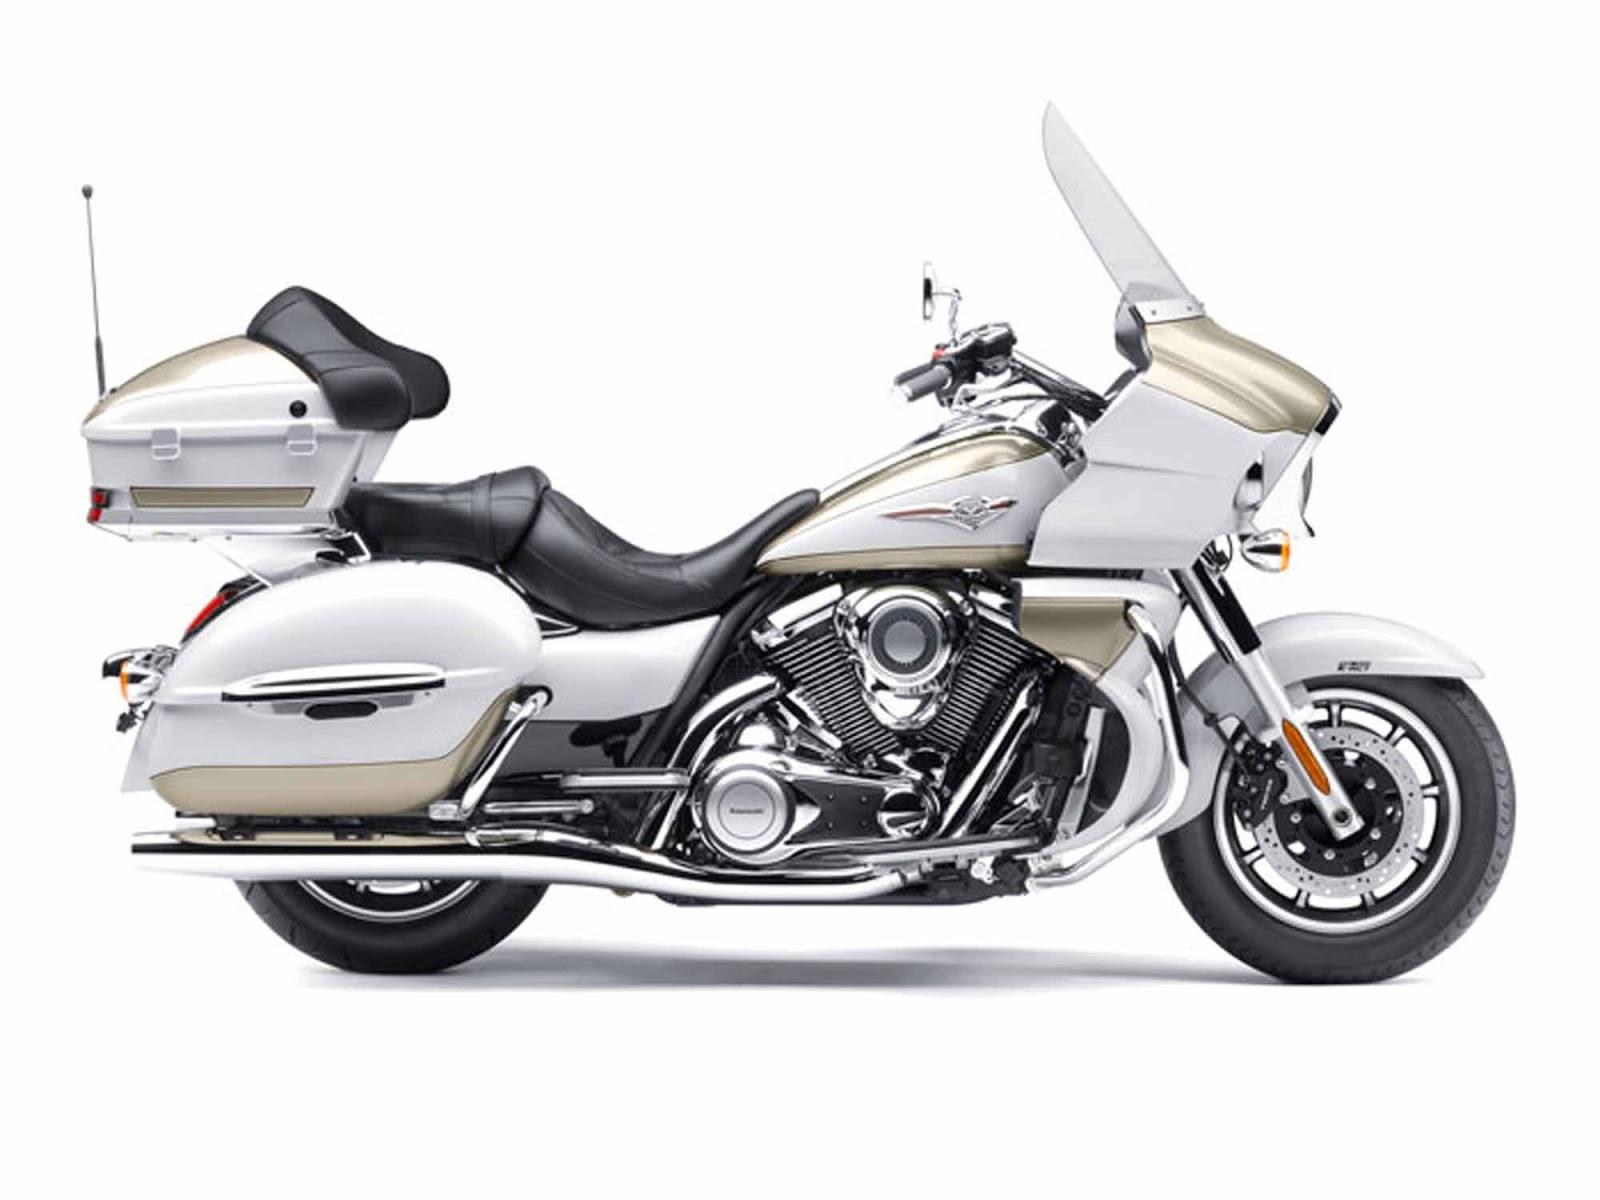 kawasaki motor bikes 2013 kawasaki vulcan 1700 voyager. Black Bedroom Furniture Sets. Home Design Ideas